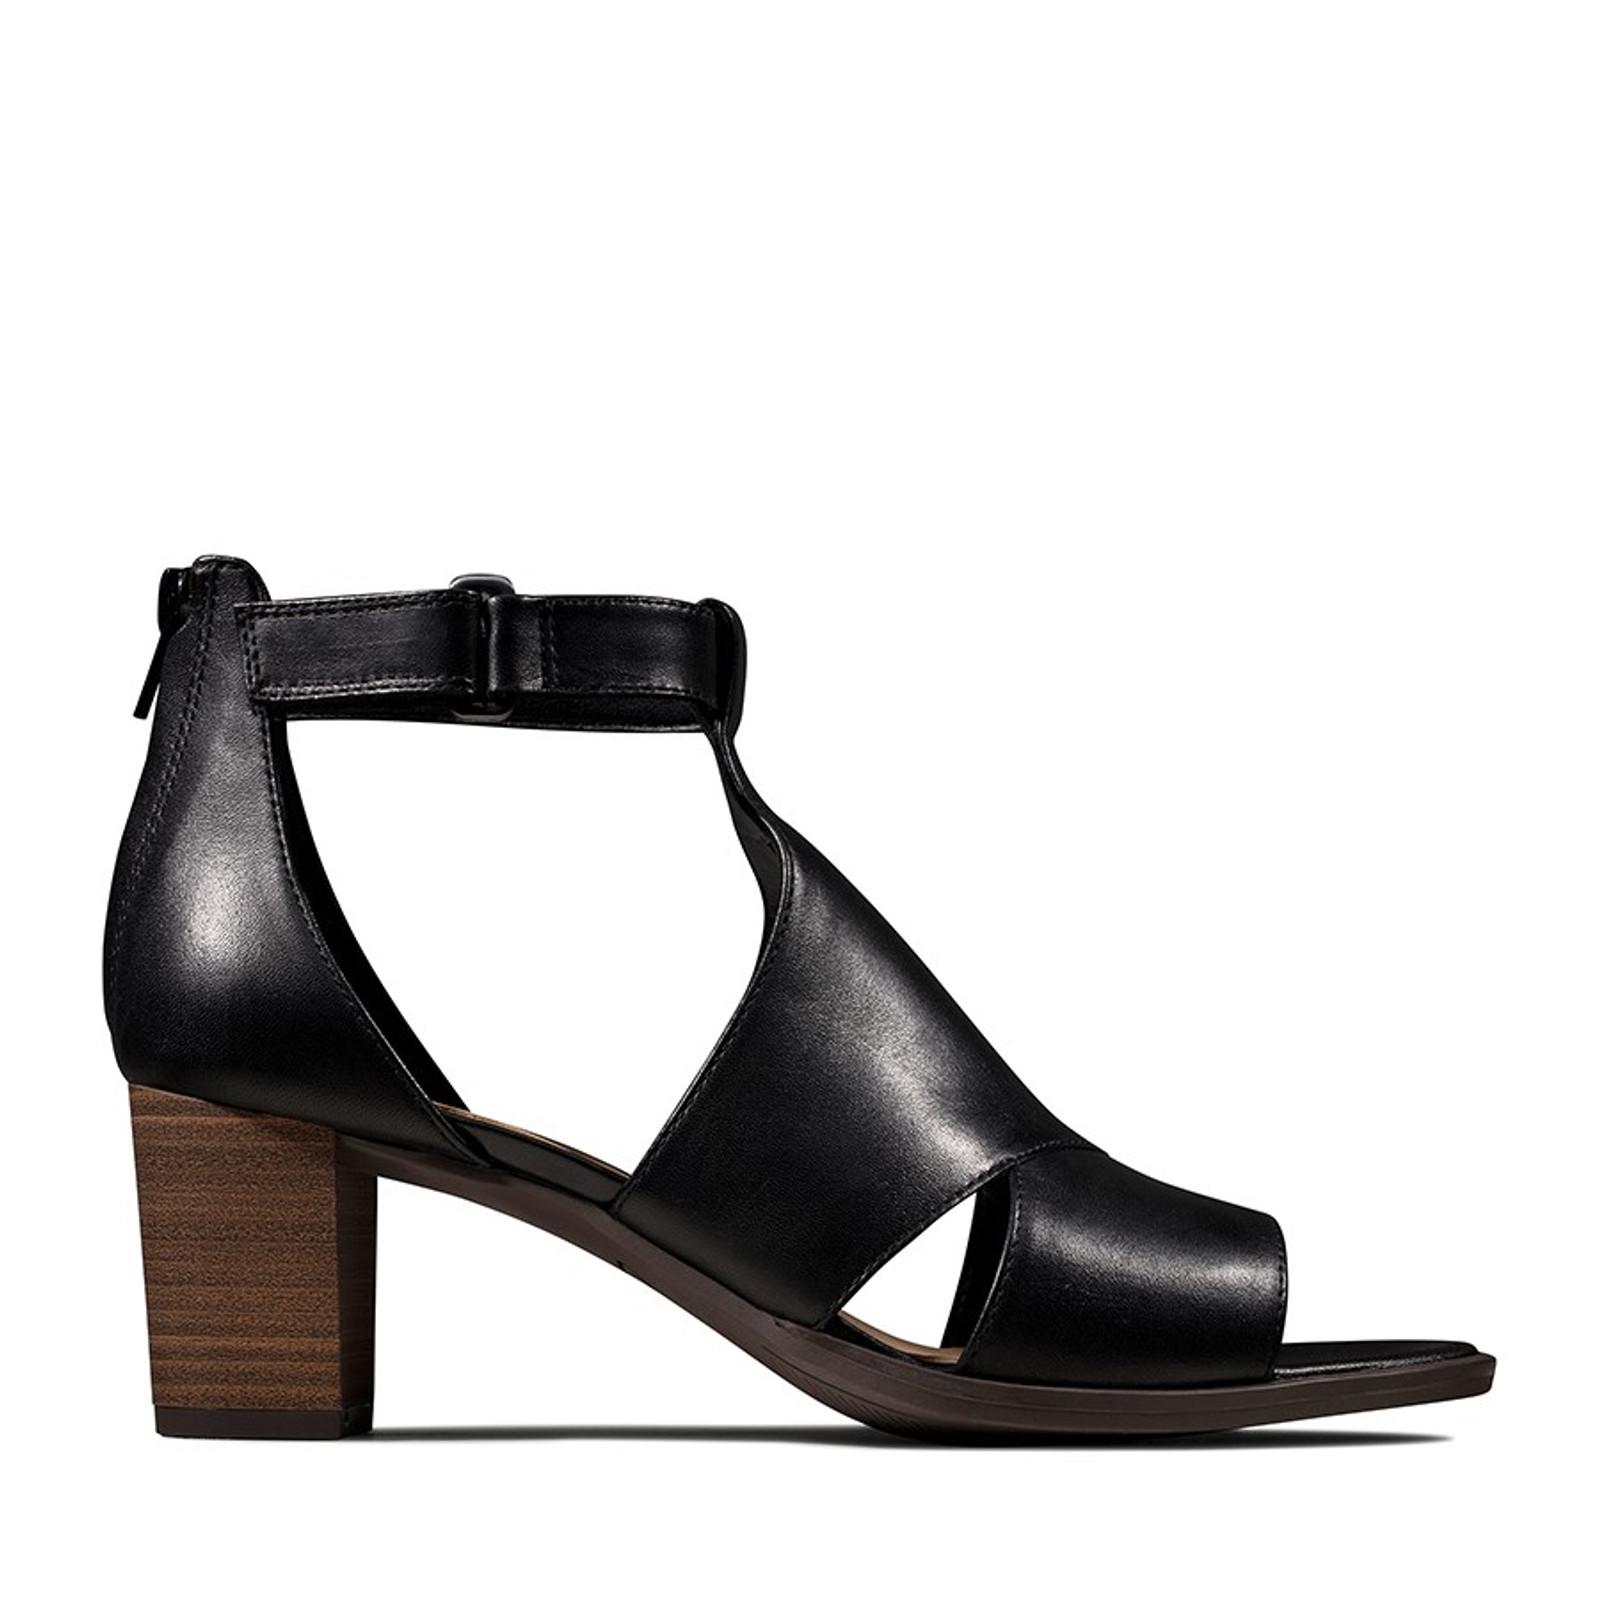 Clarks Womens KAYLIN60 GLAD Black Leather